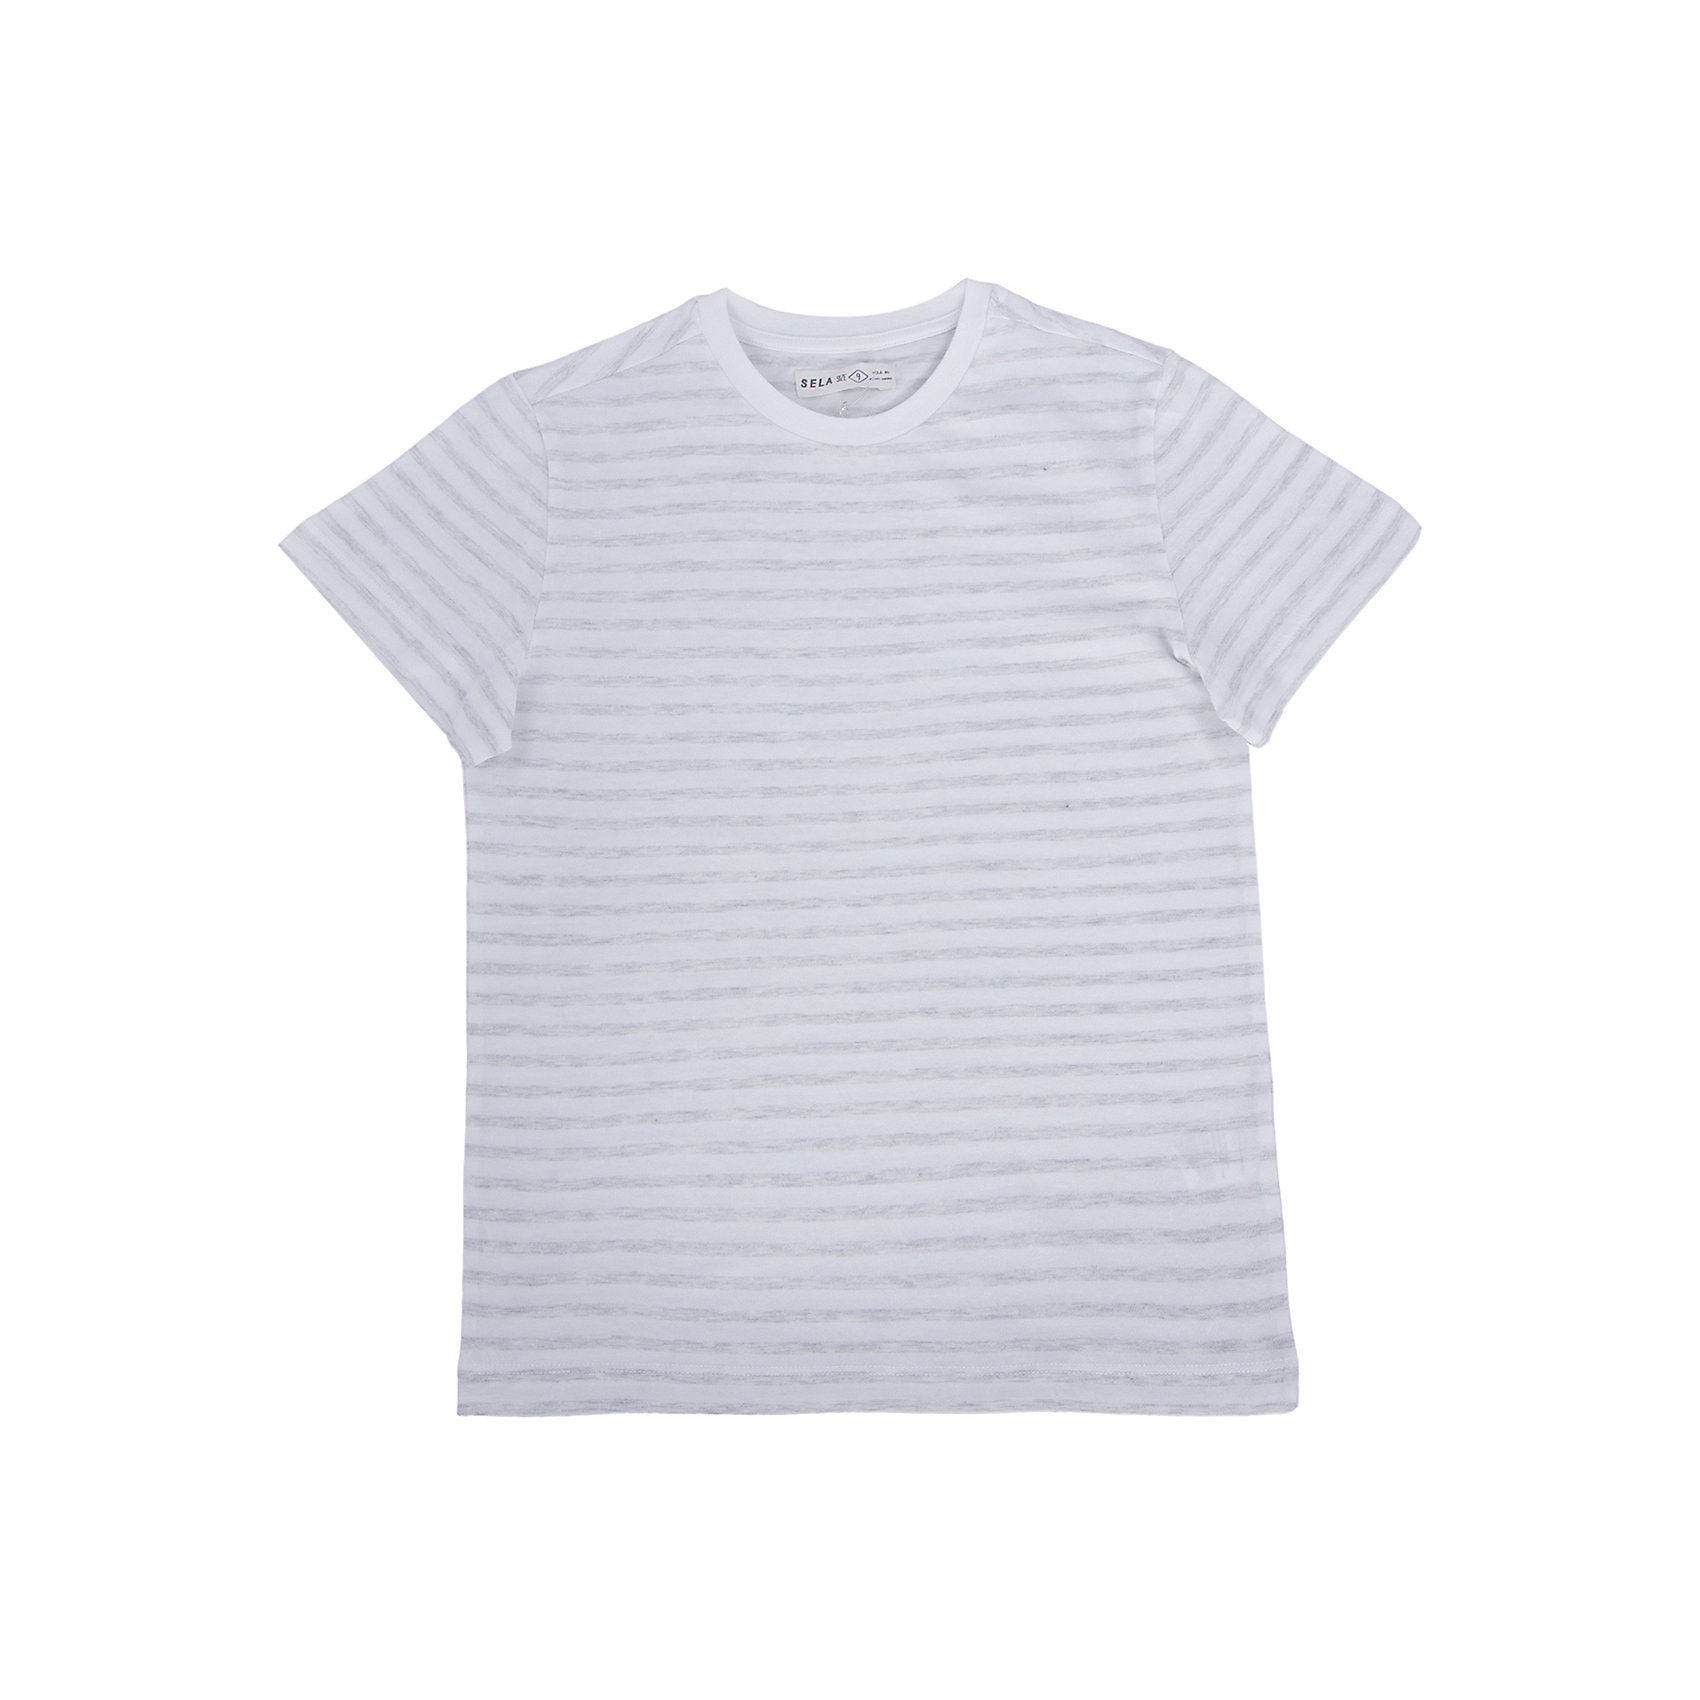 SELA Футболка для мальчика SELA trybeyond футболка для мальчика 999 74498 00 40z серый trybeyond